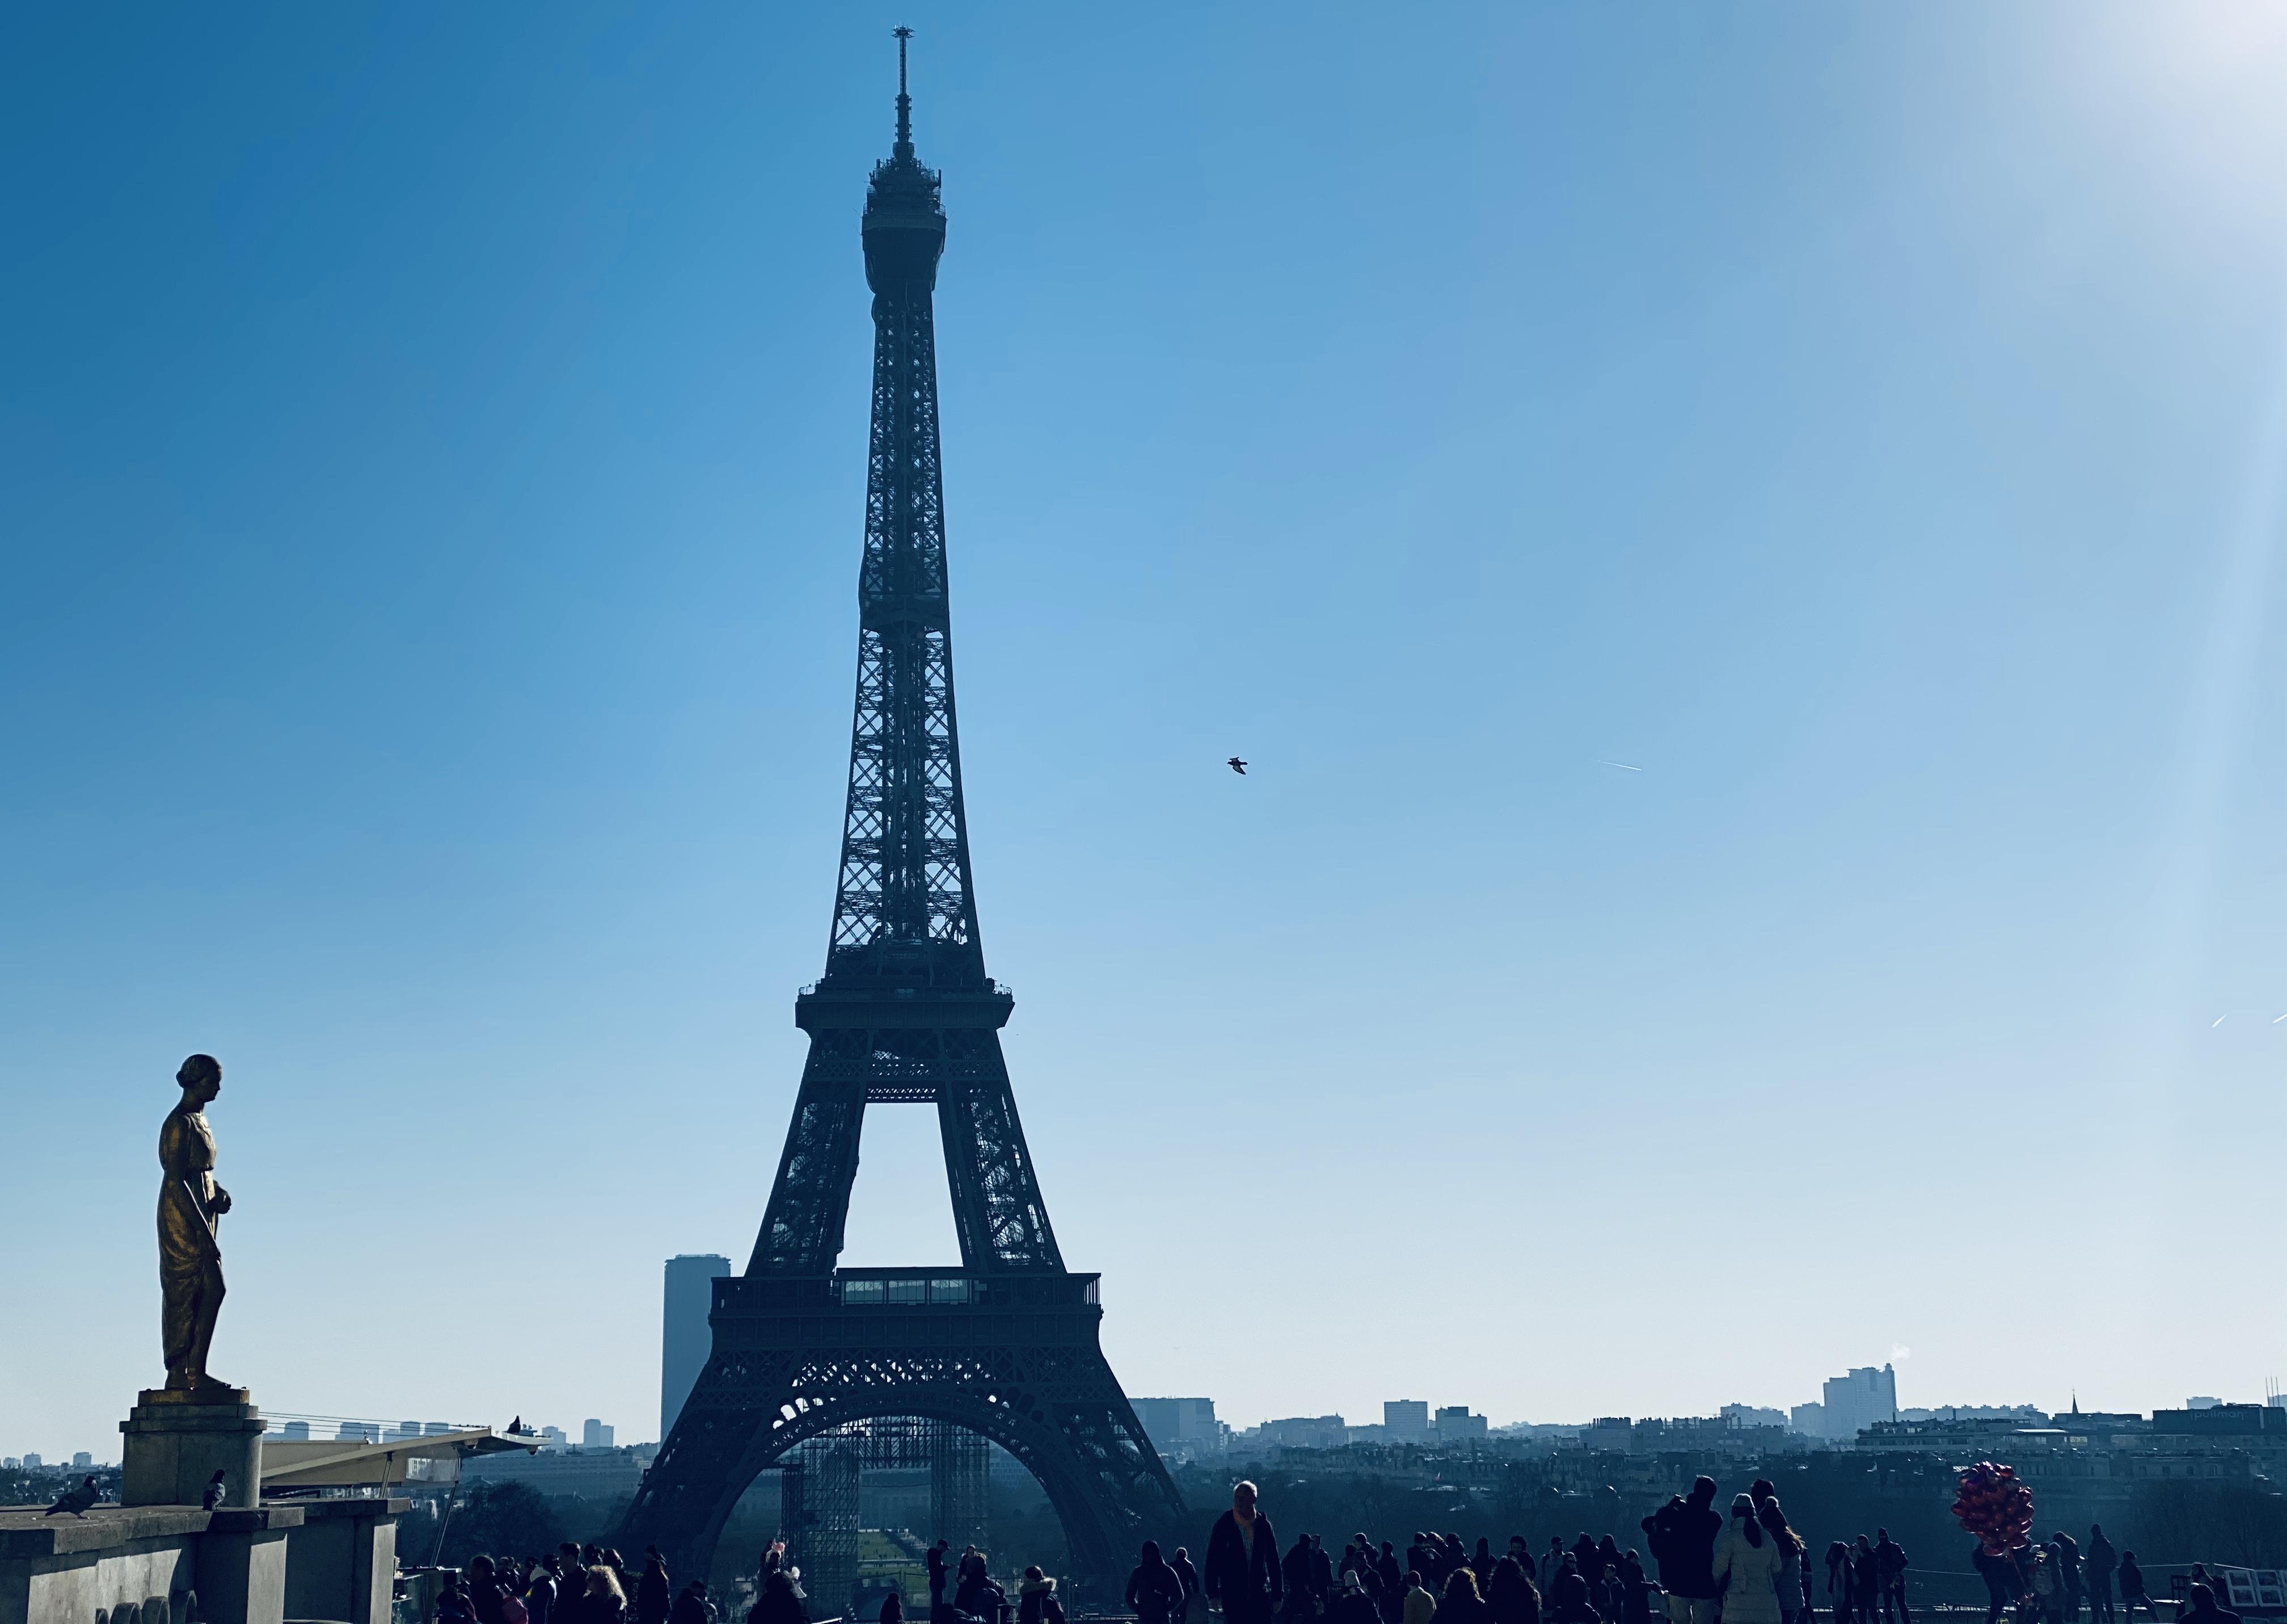 Two Ladies @ The Trocadéro in Paris